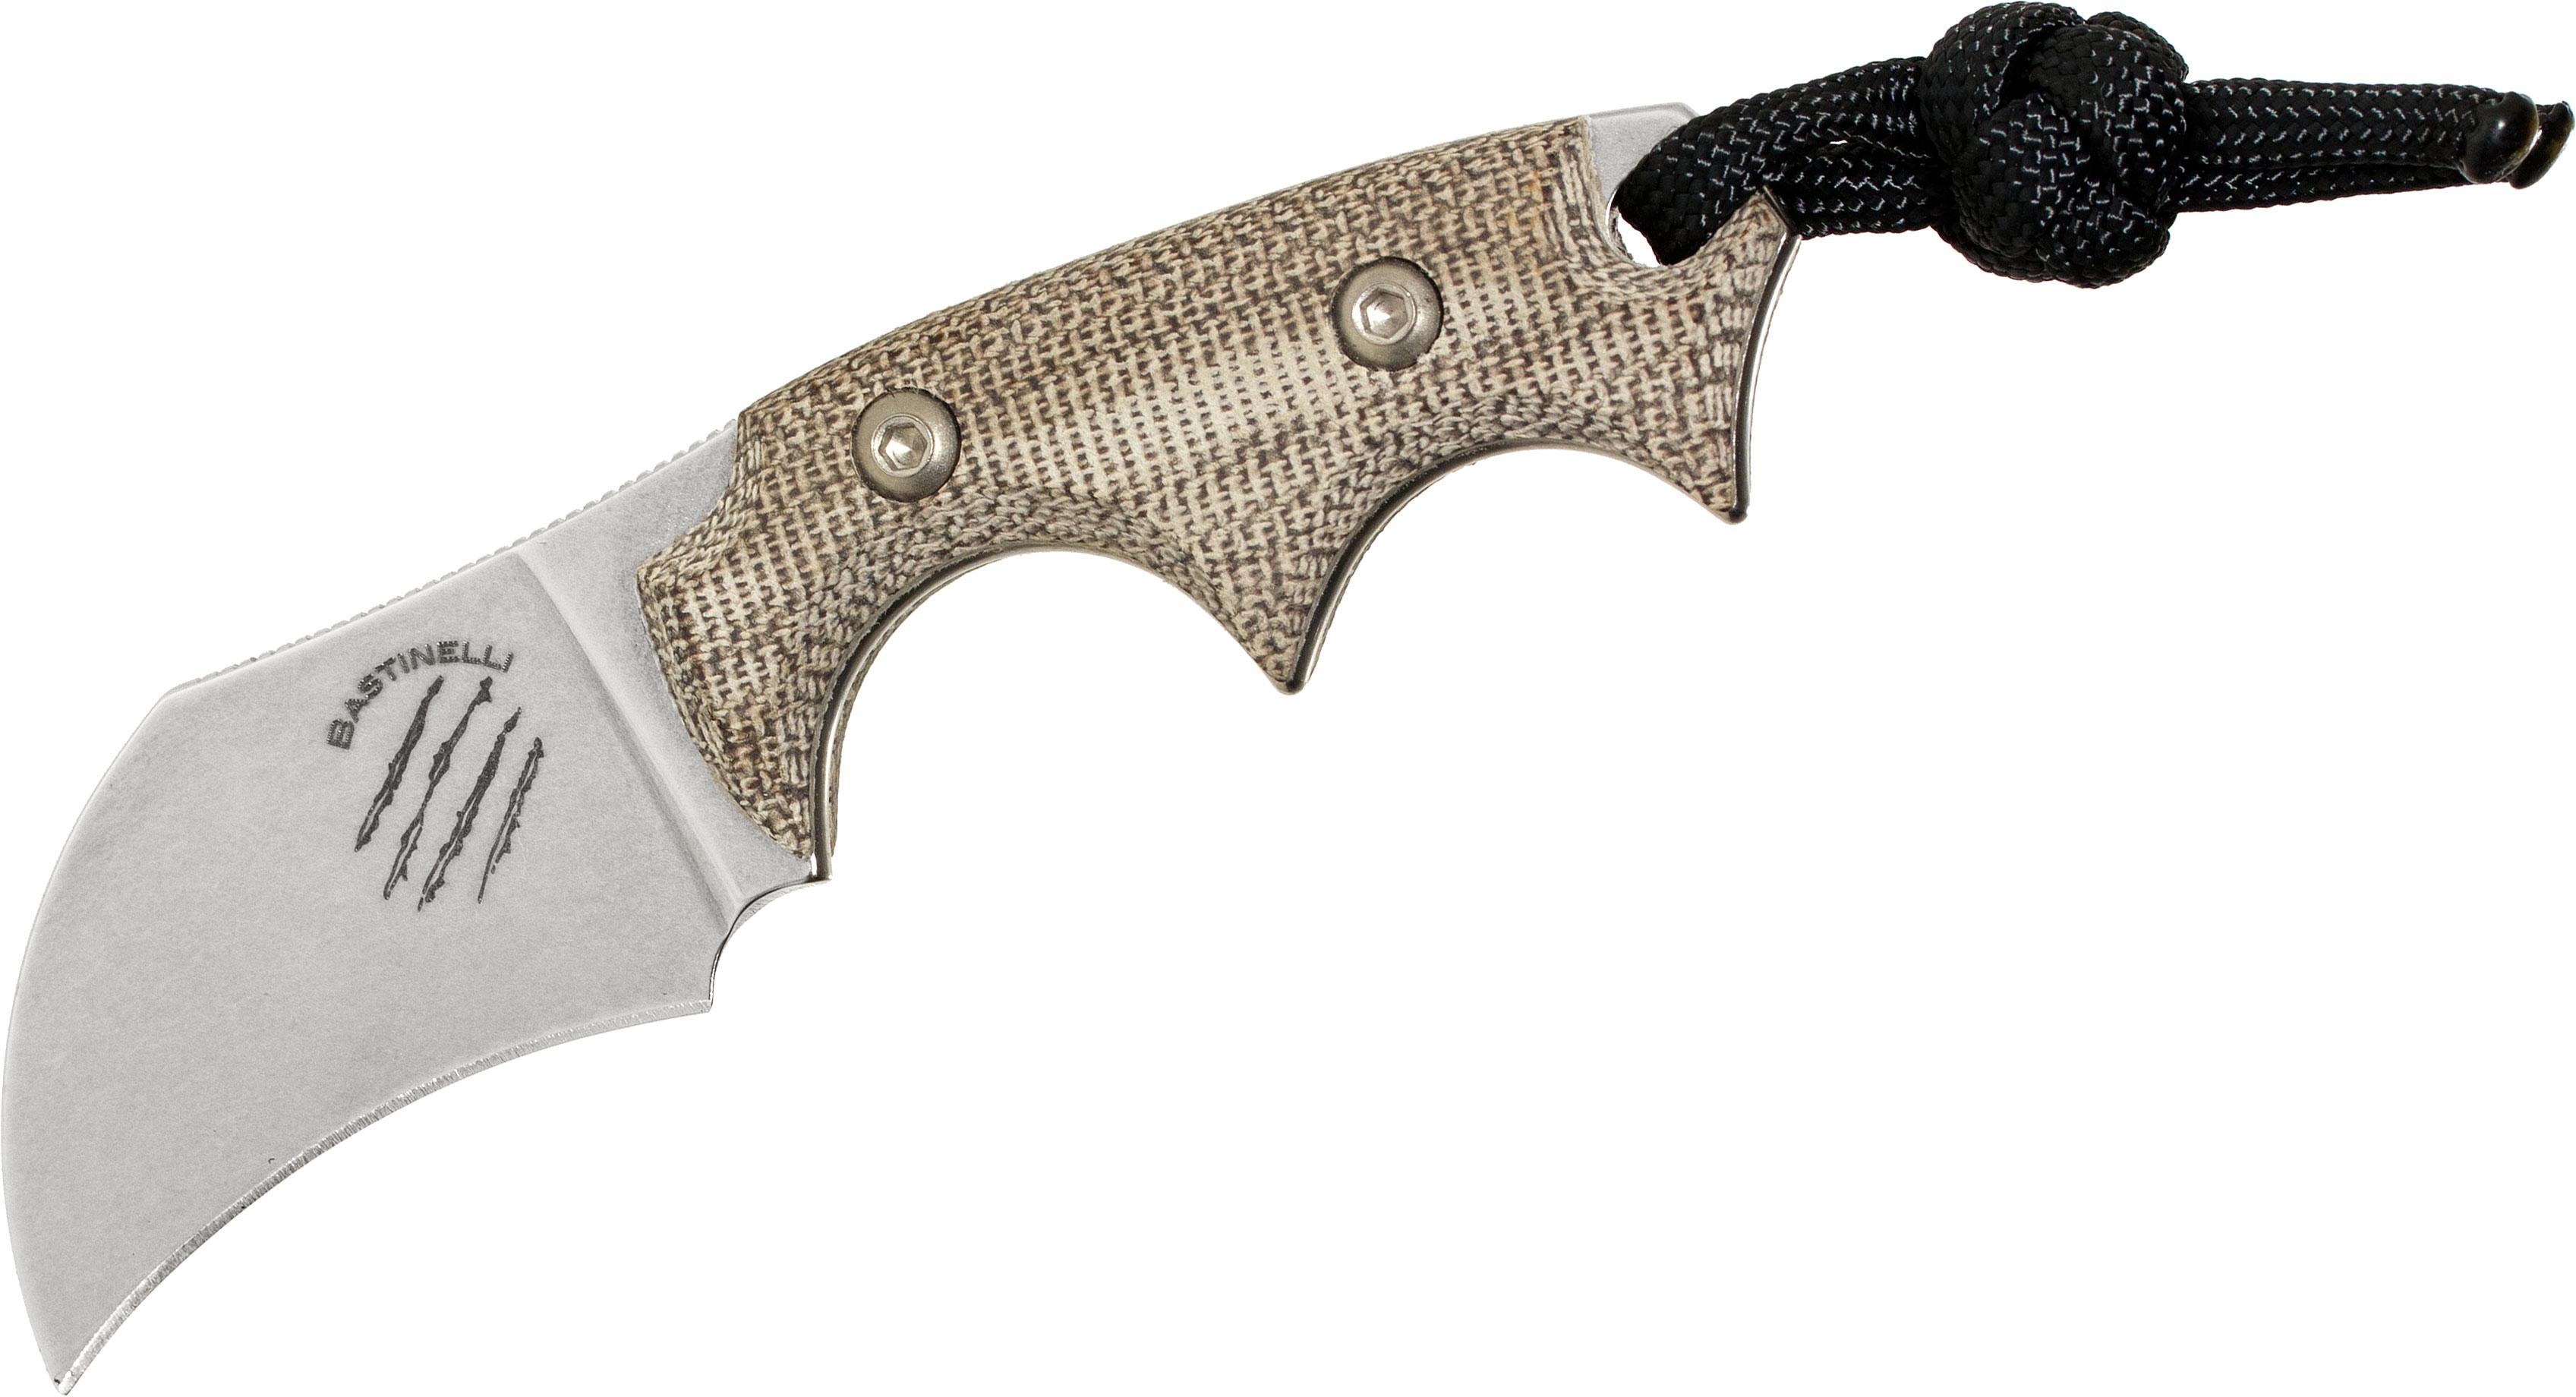 Bastinelli Creations BB Drago Champi Fixed 2 inch N690CO Hawkbill Blade, Micarta Handles, Kydex Sheath